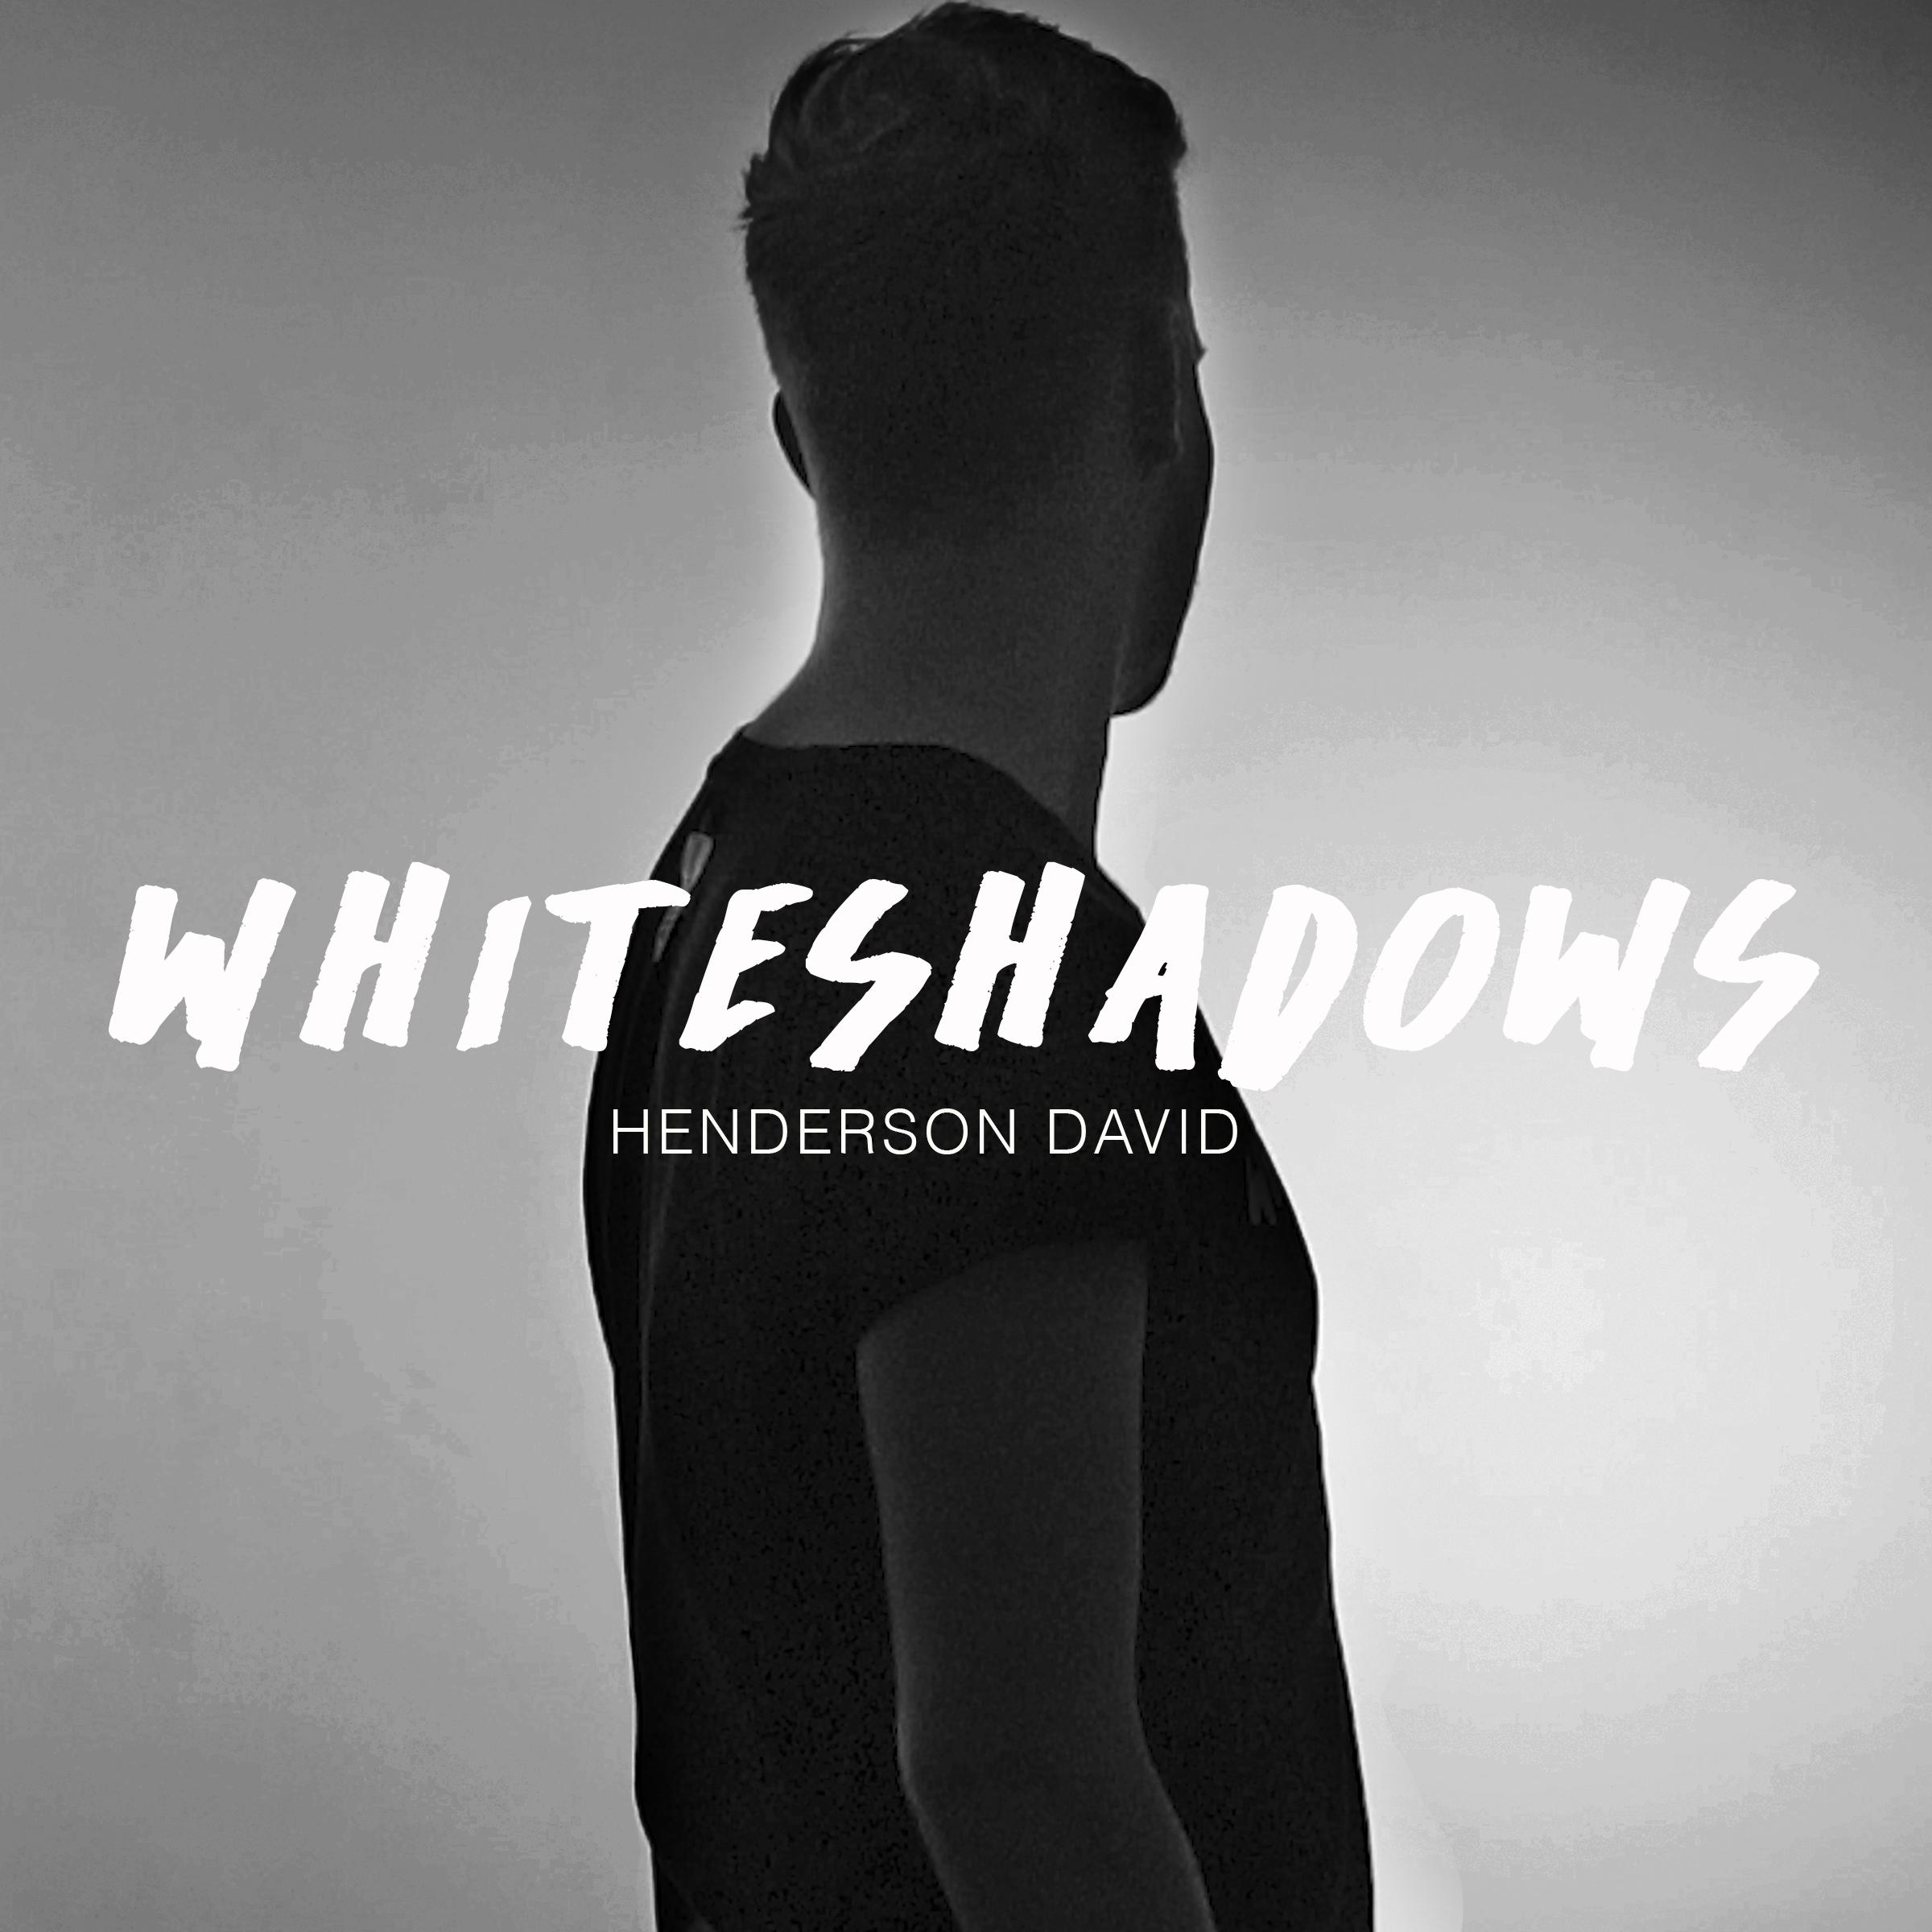 Whiteshadows_DIGI_Cover_0